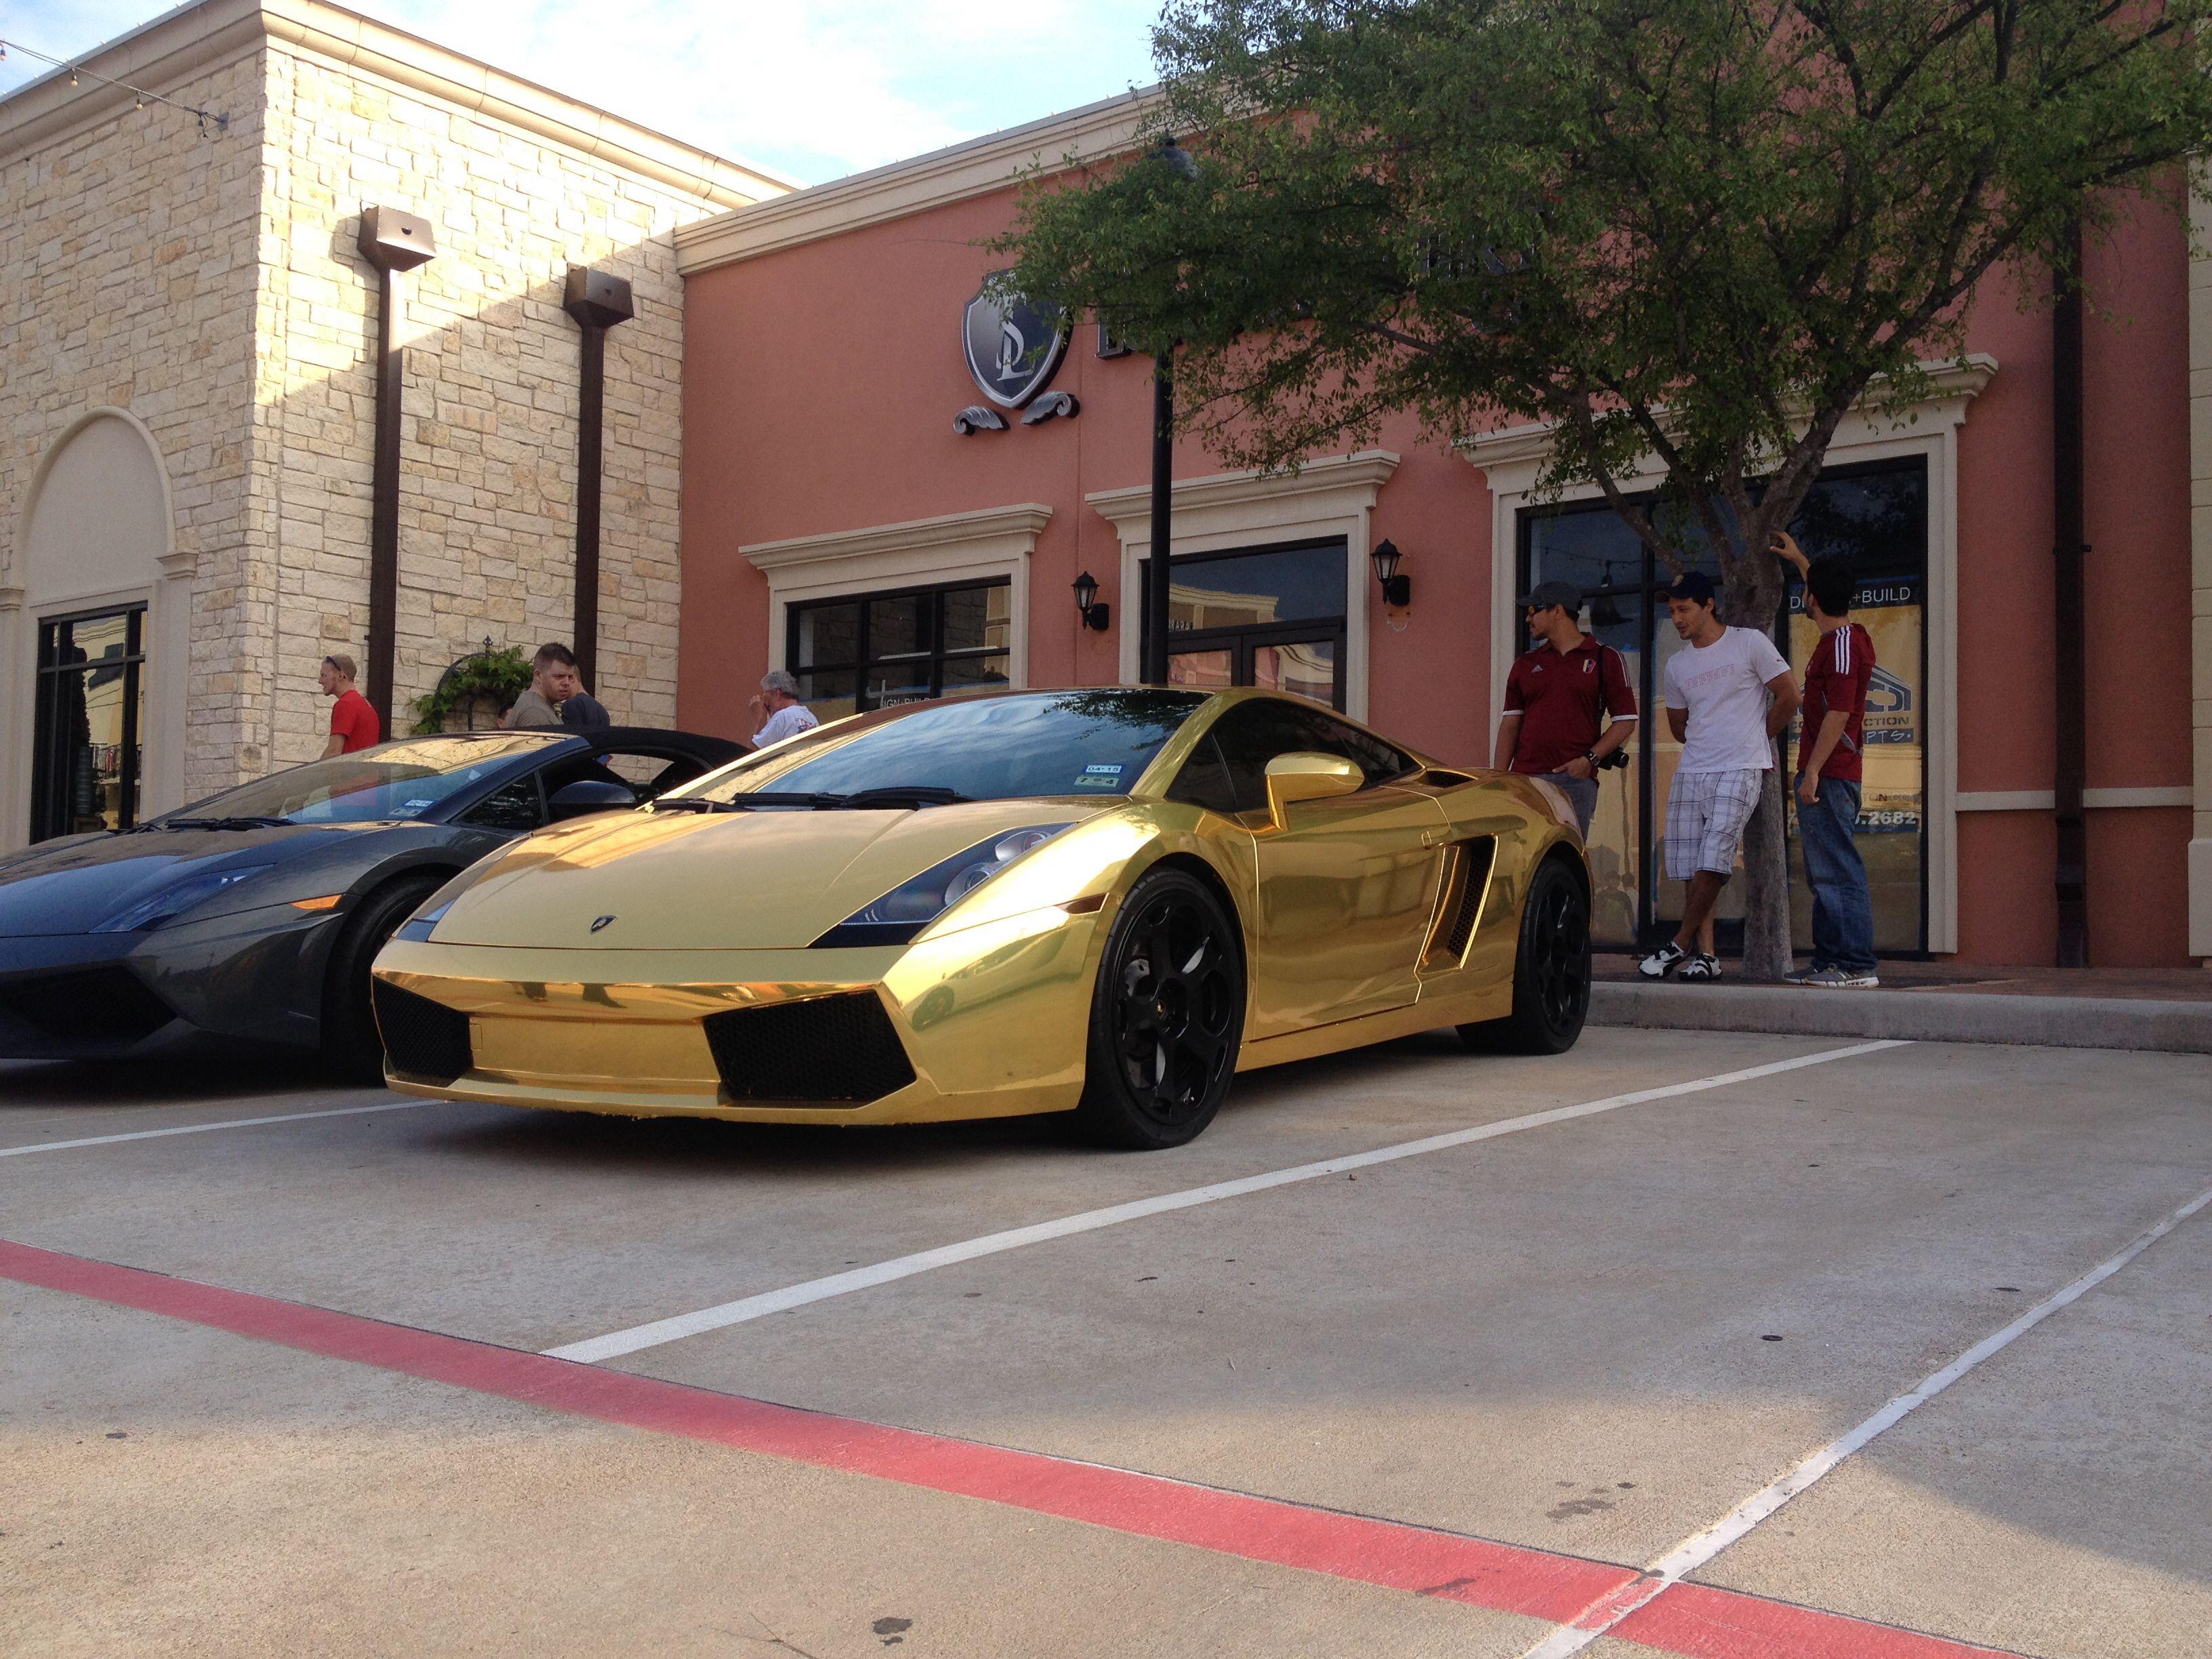 Luxury caravan with full size sports car garage from futuria - A Sexy Gold Wrapped Lamborghini Gallardo At Houston Coffee Cars Lambirghini Gallardo Gold